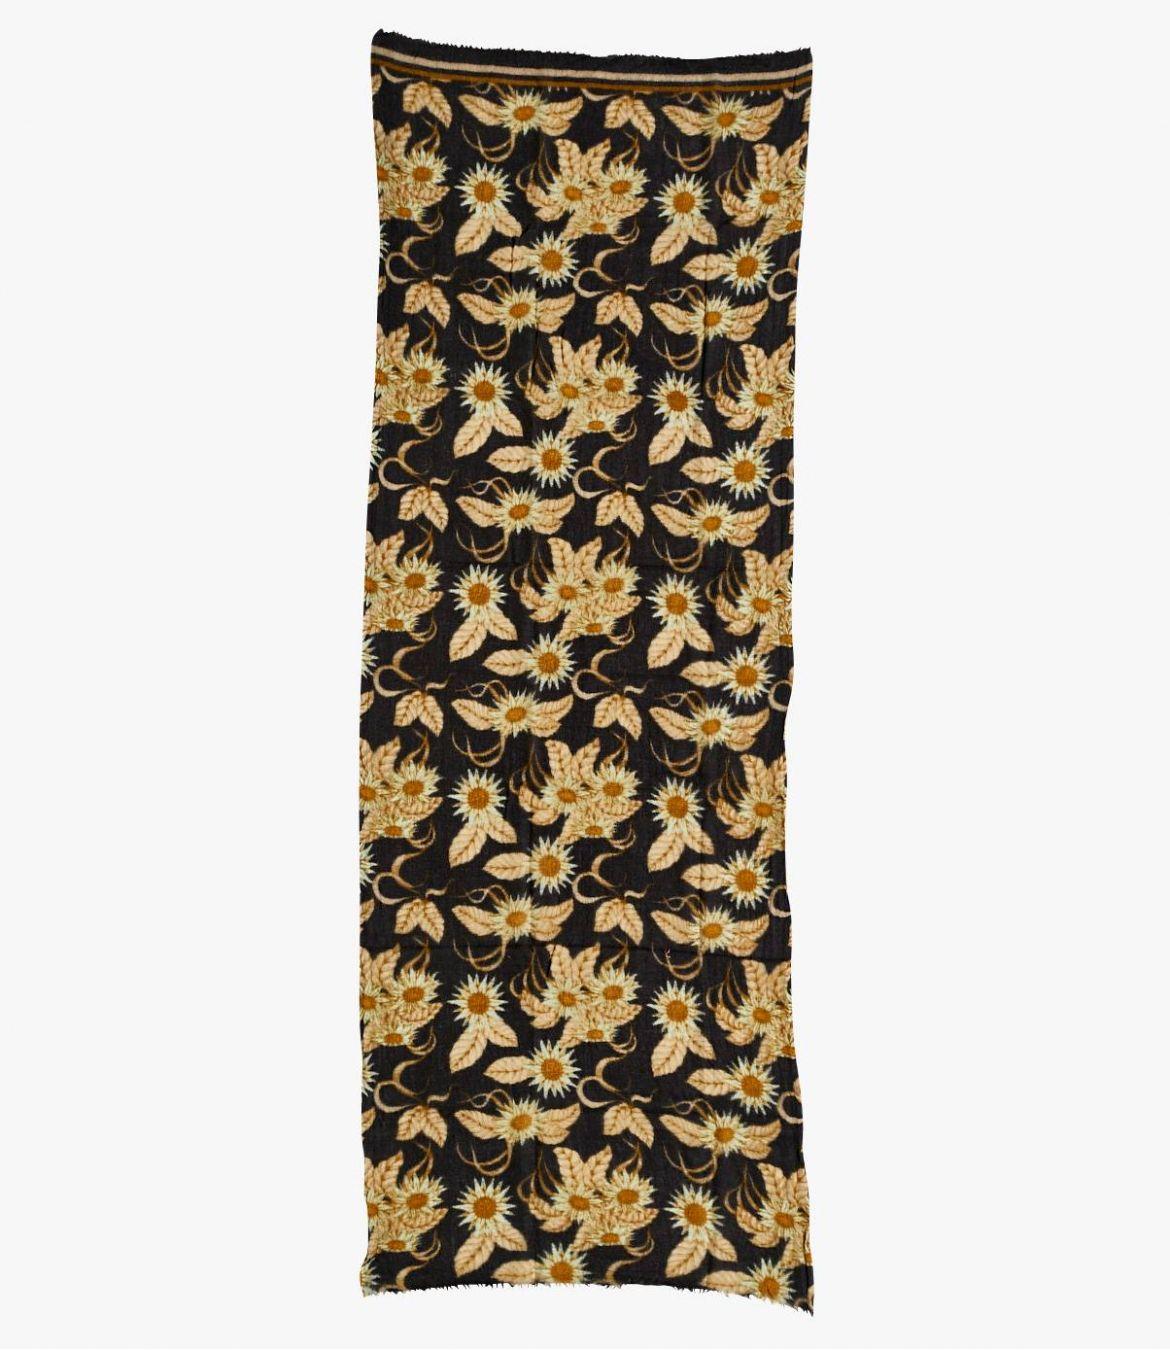 FLEURIE Women's Wool Scarf 70x190 cm Storiatipic - 2